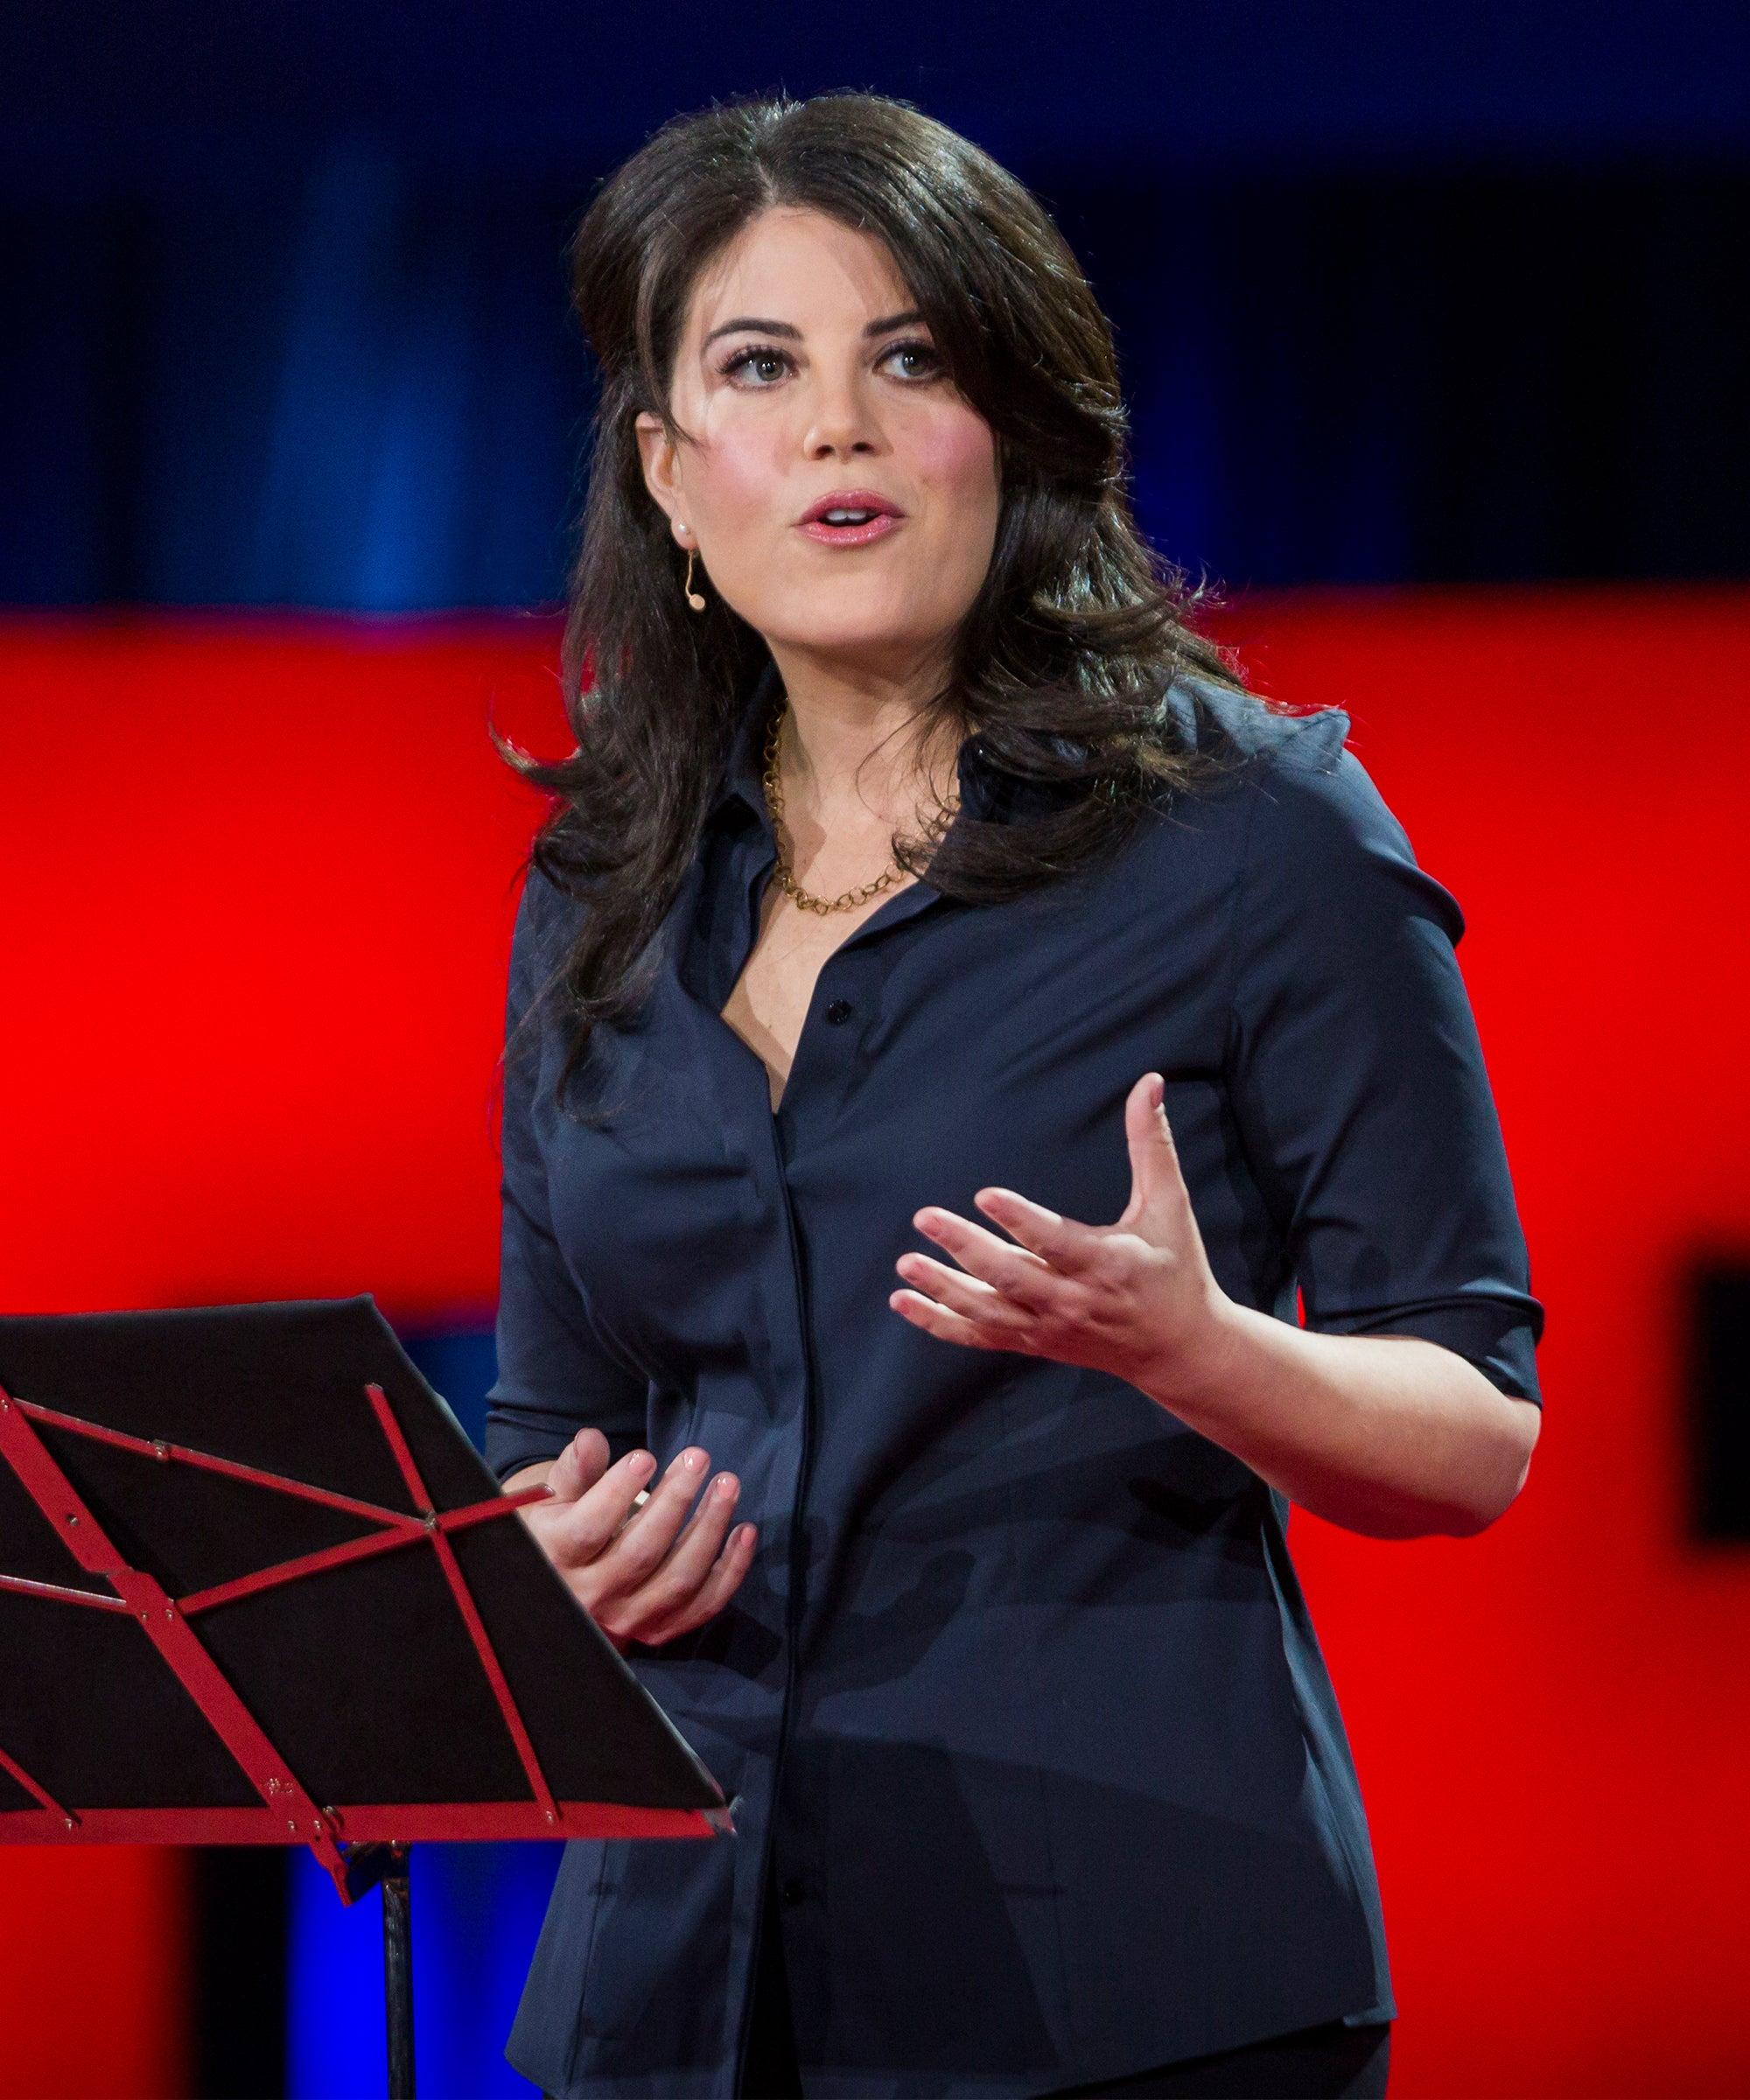 Monica Lewinsky On Cyberbullying, Caroline Calloway, And Gen Z's Approach To Social Media